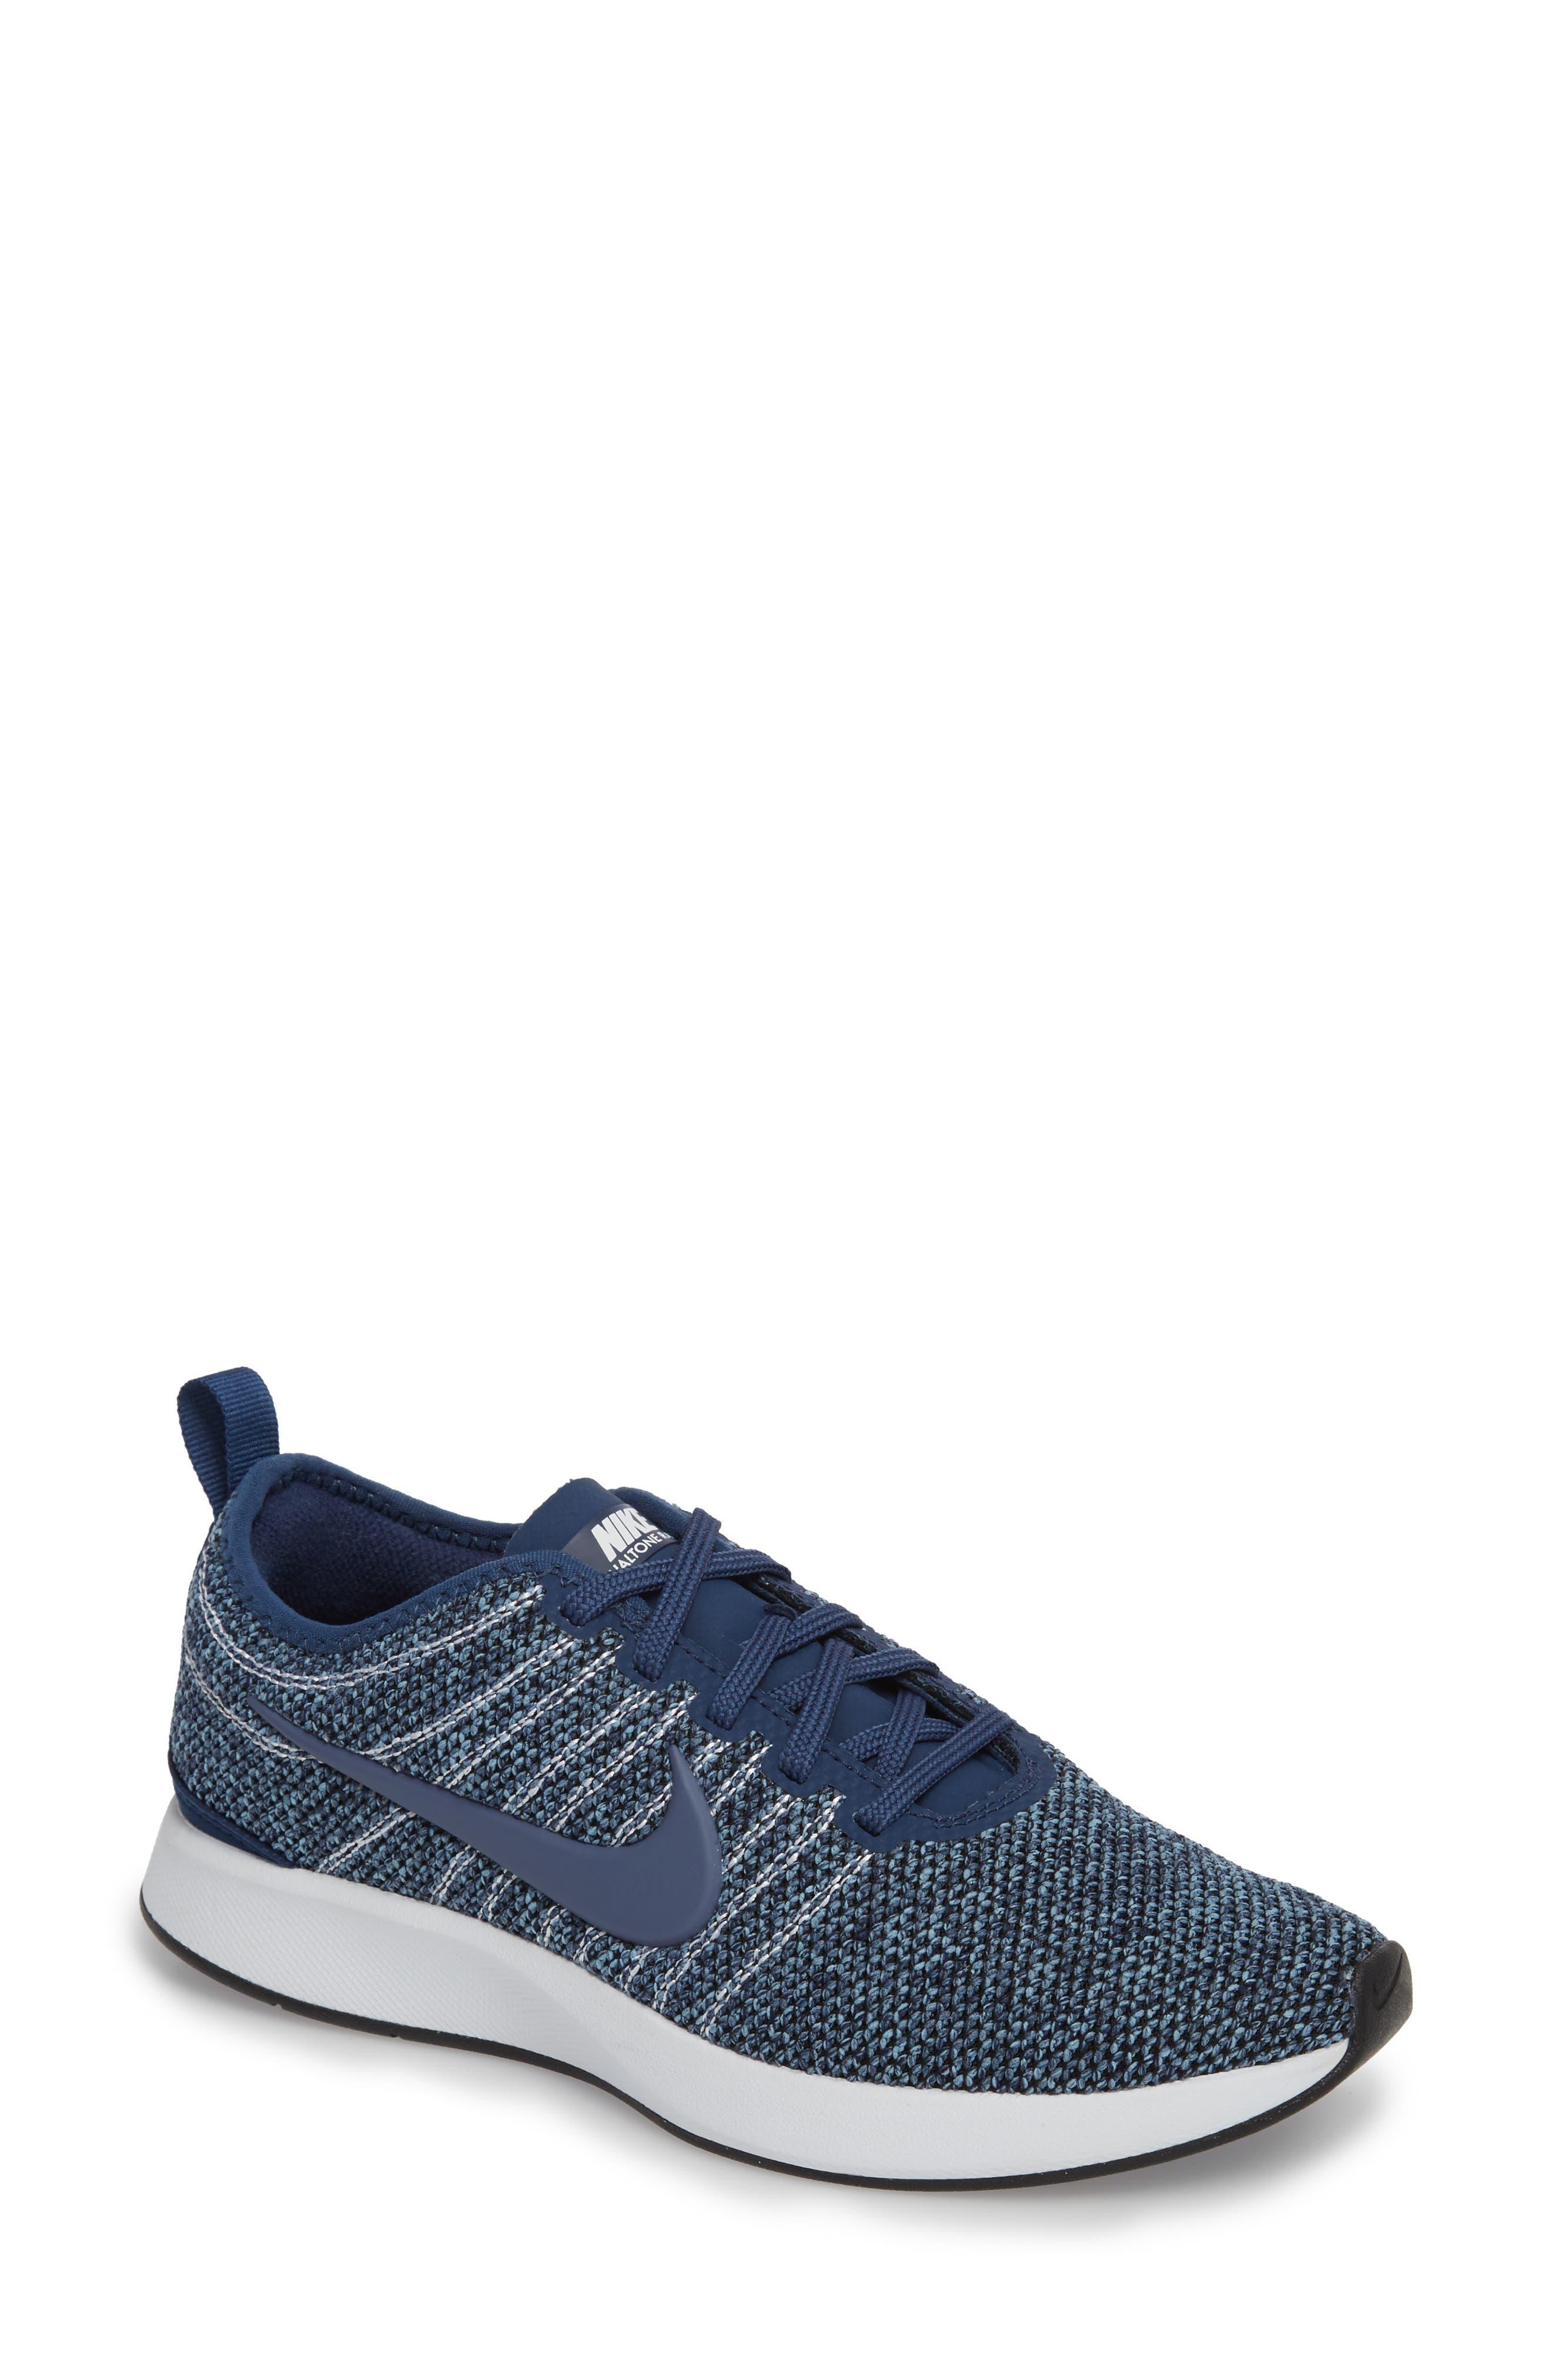 Dualtone Racer PRM Sneaker,                             Main thumbnail 1, color,                             Navy/ Diffused Blue